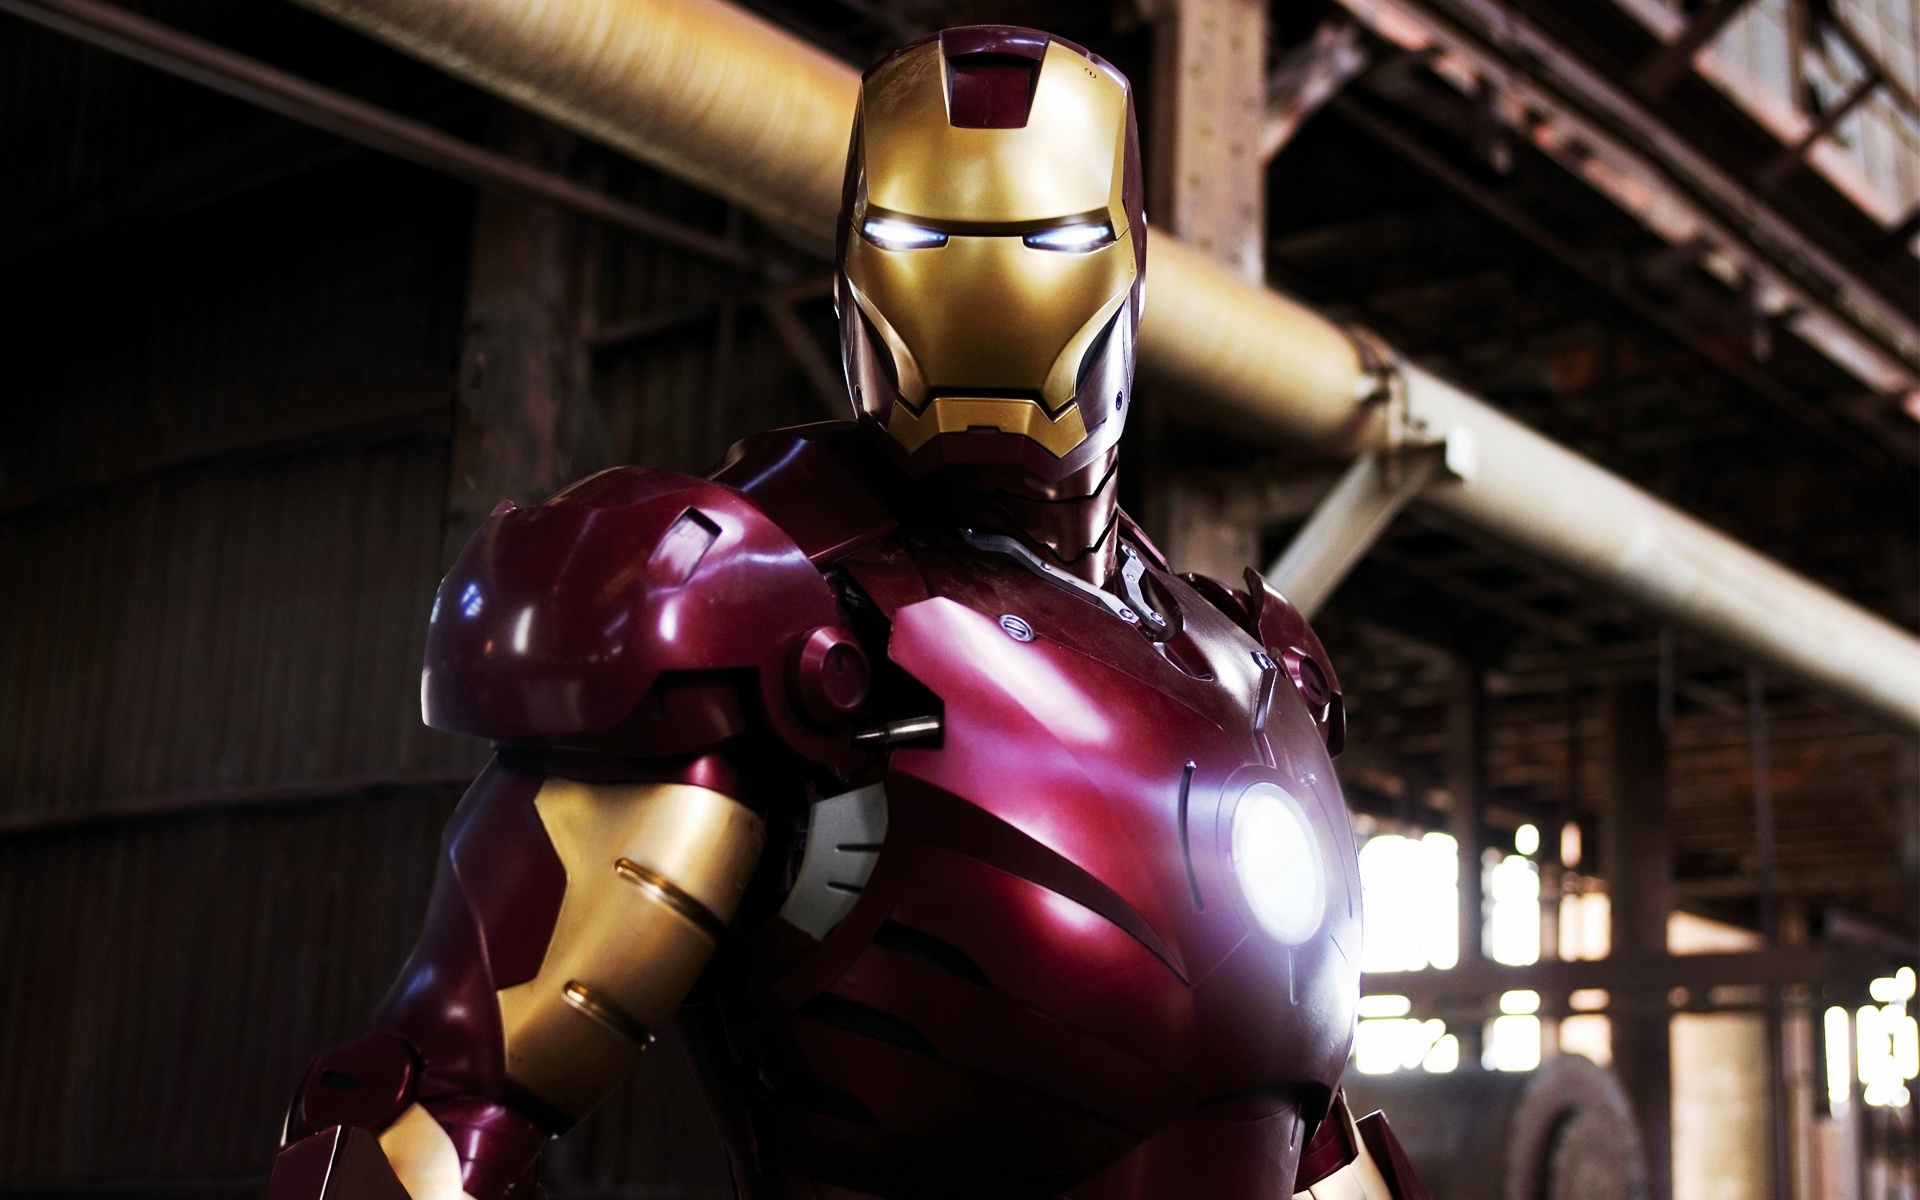 Download wallpaper iron man movie still downloadfy download wallpaper full hd 19201080 voltagebd Choice Image